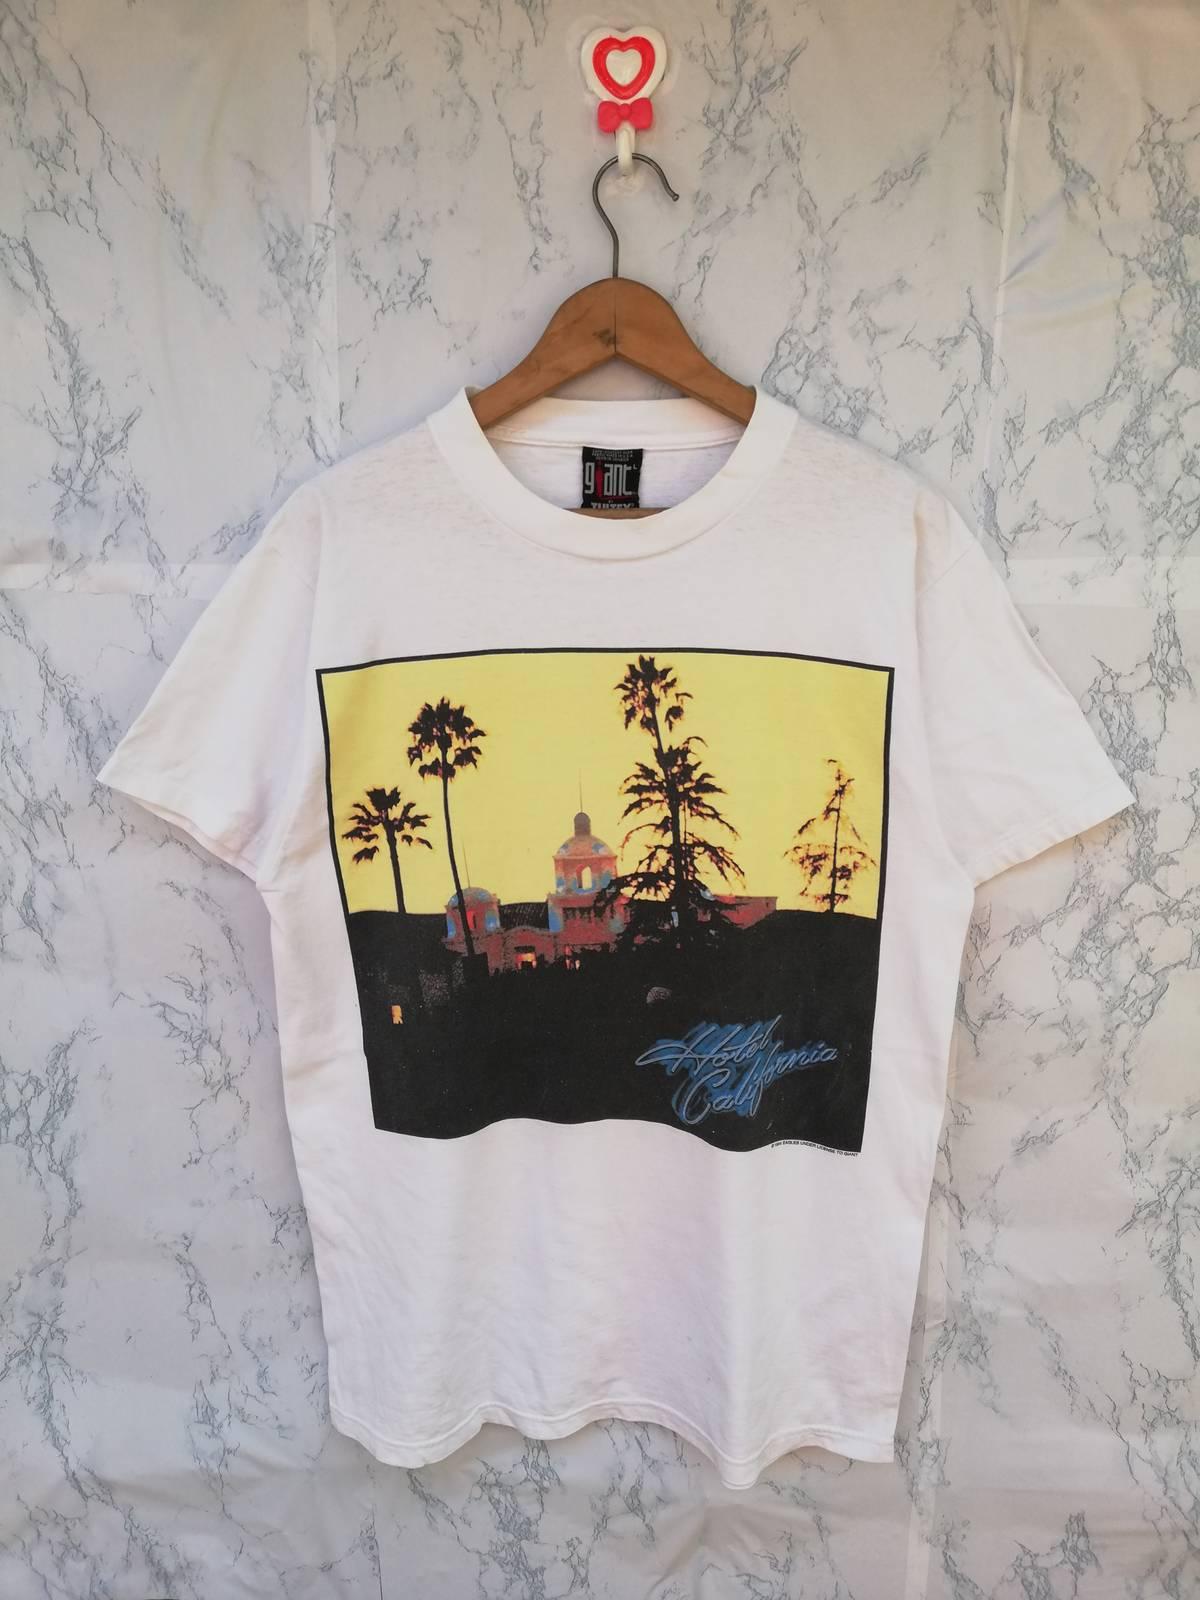 Eagles Hotel California Song Lyrics T-shirt Music Legends Mens or Ladies Tee